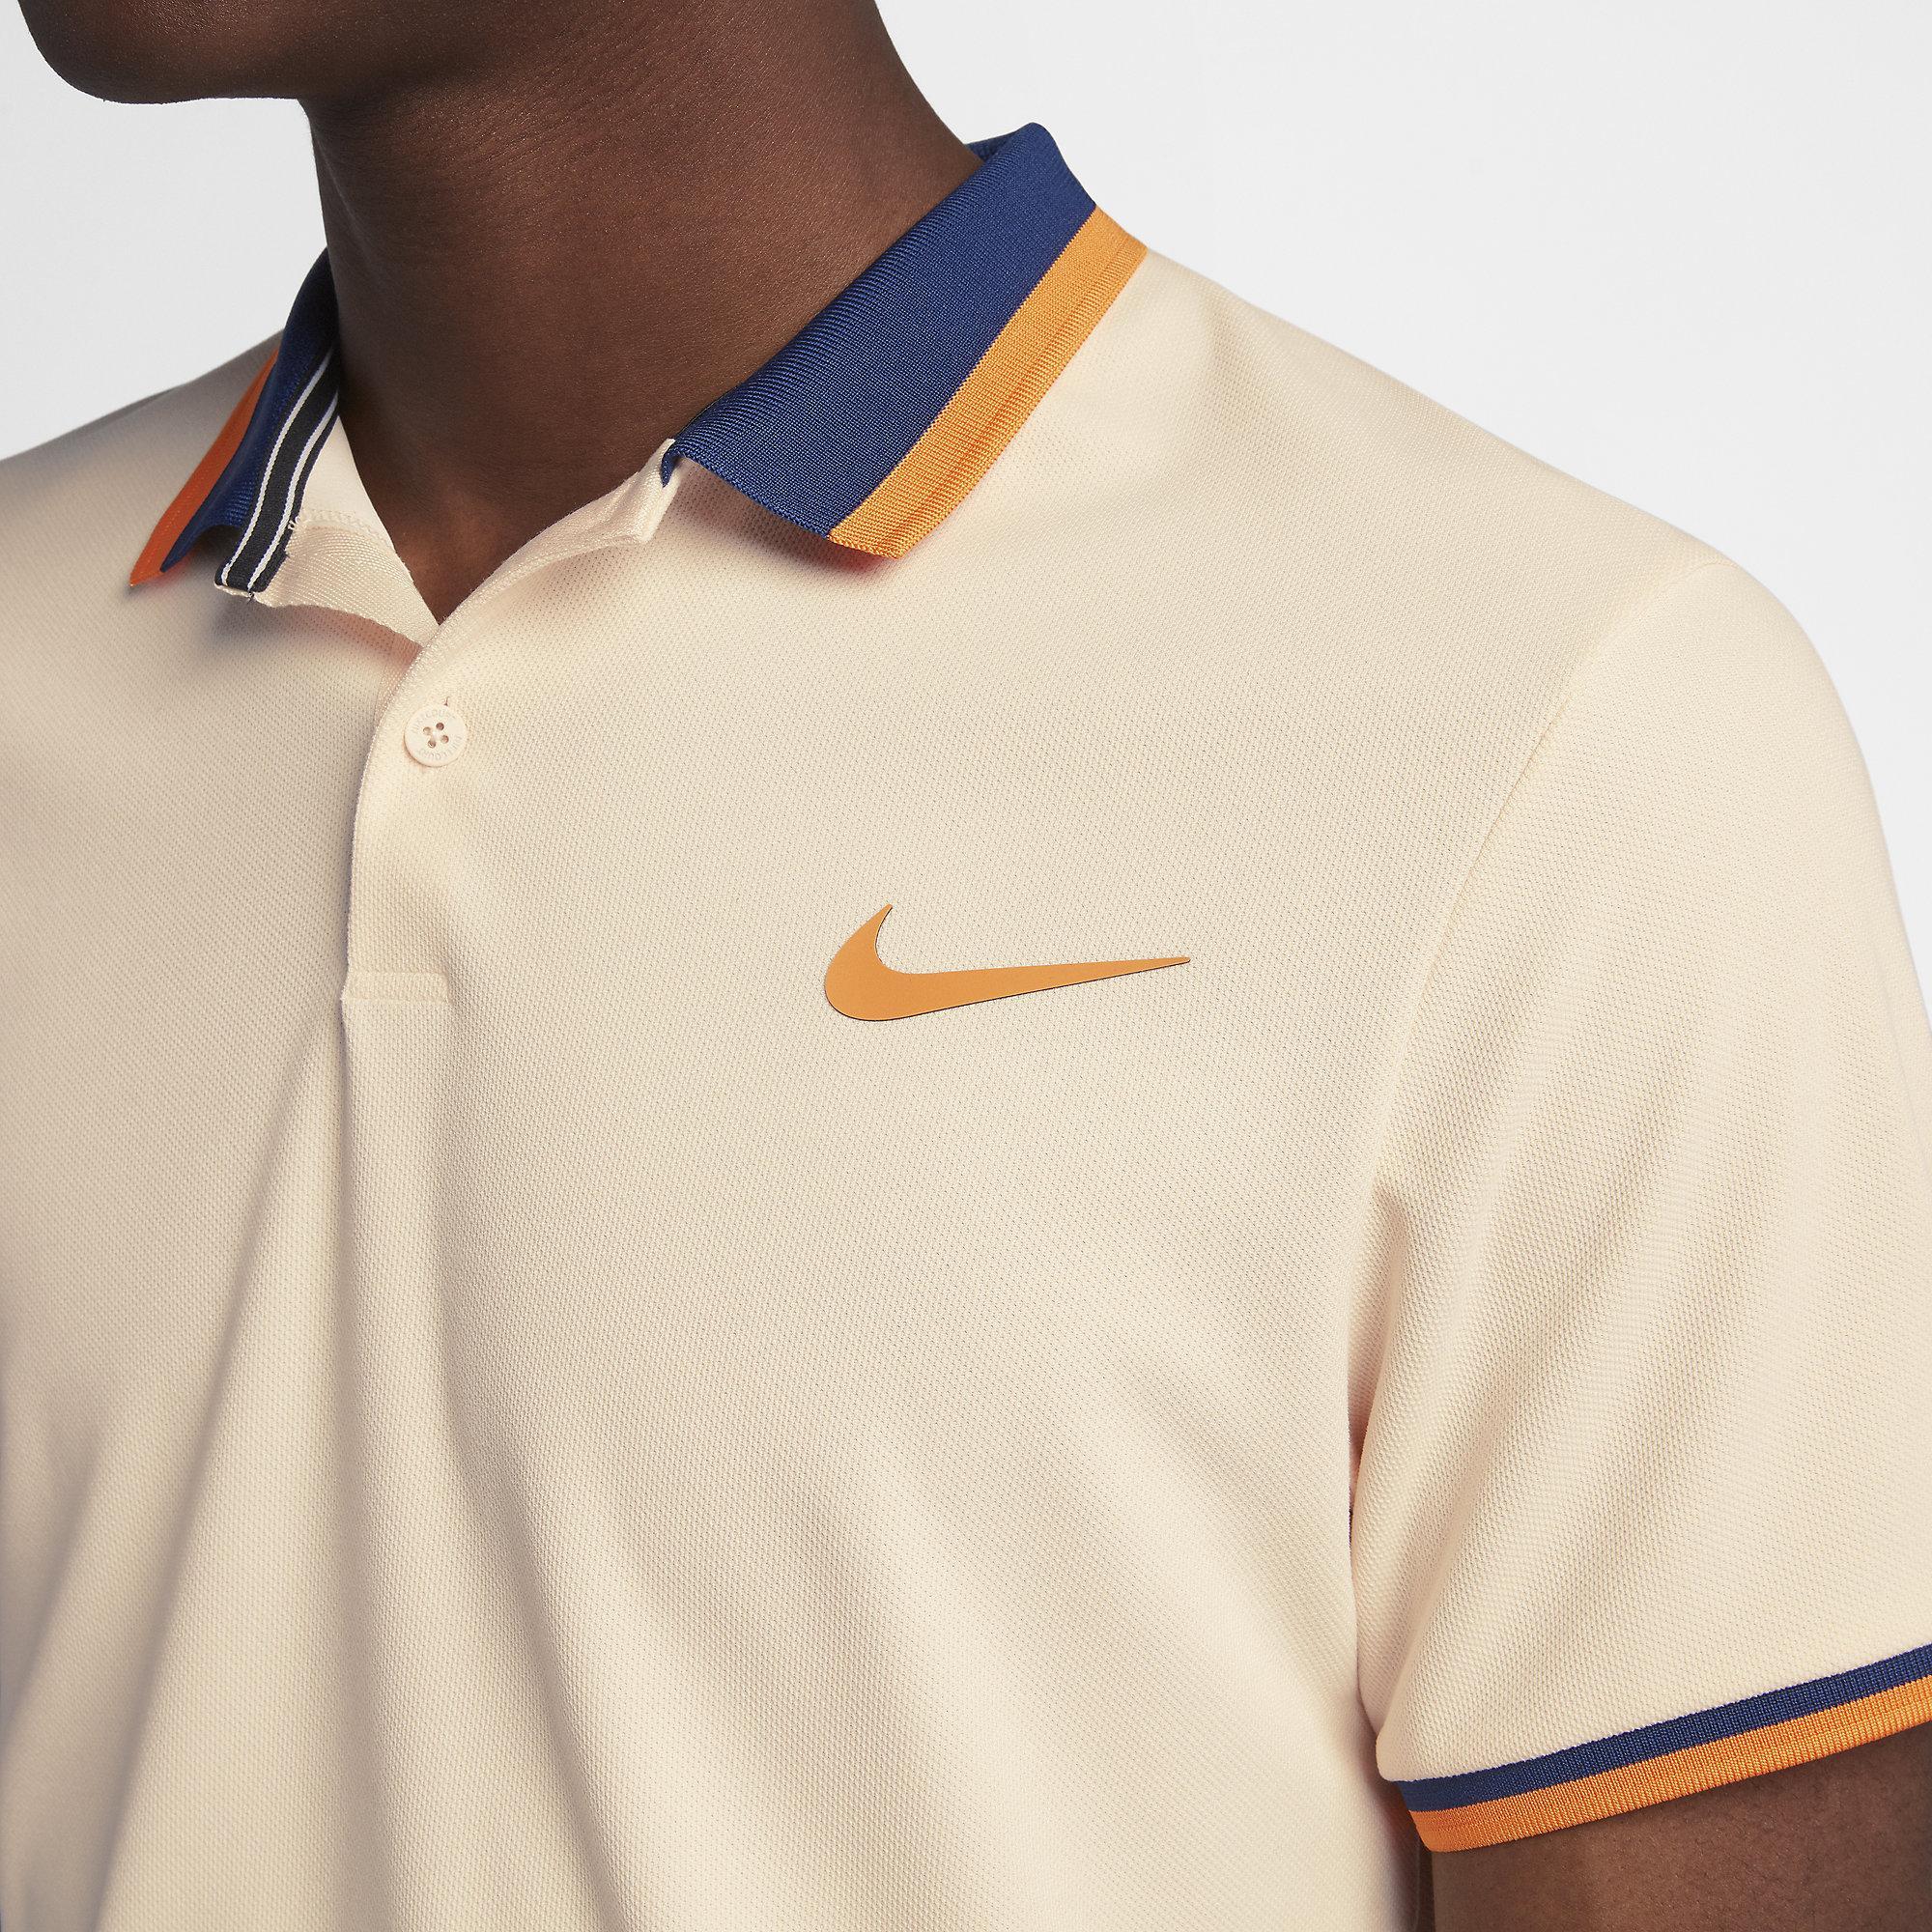 78a771dee Nike Mens Advantage Tennis Polo - Guava Ice/Blue Void/Orange Peel ...